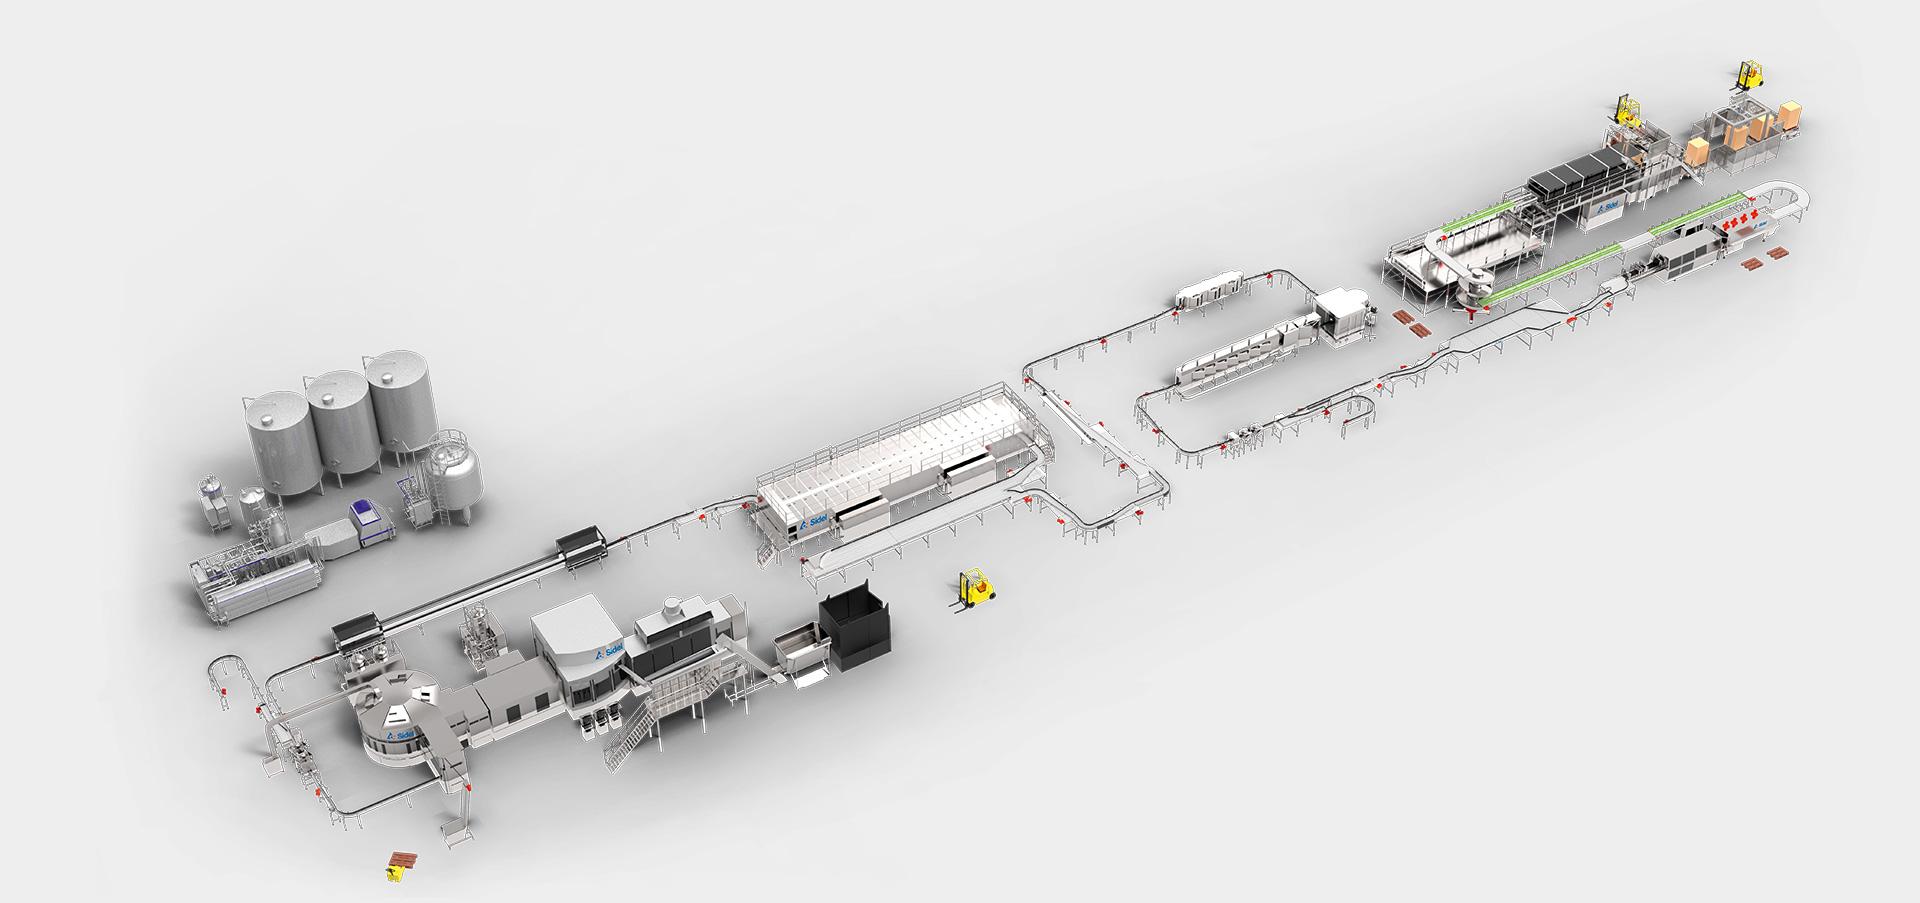 Complete Lines Ladder Logic Diagram For Bottle Filling System Solution Including Tetra Pak Processing Equipment